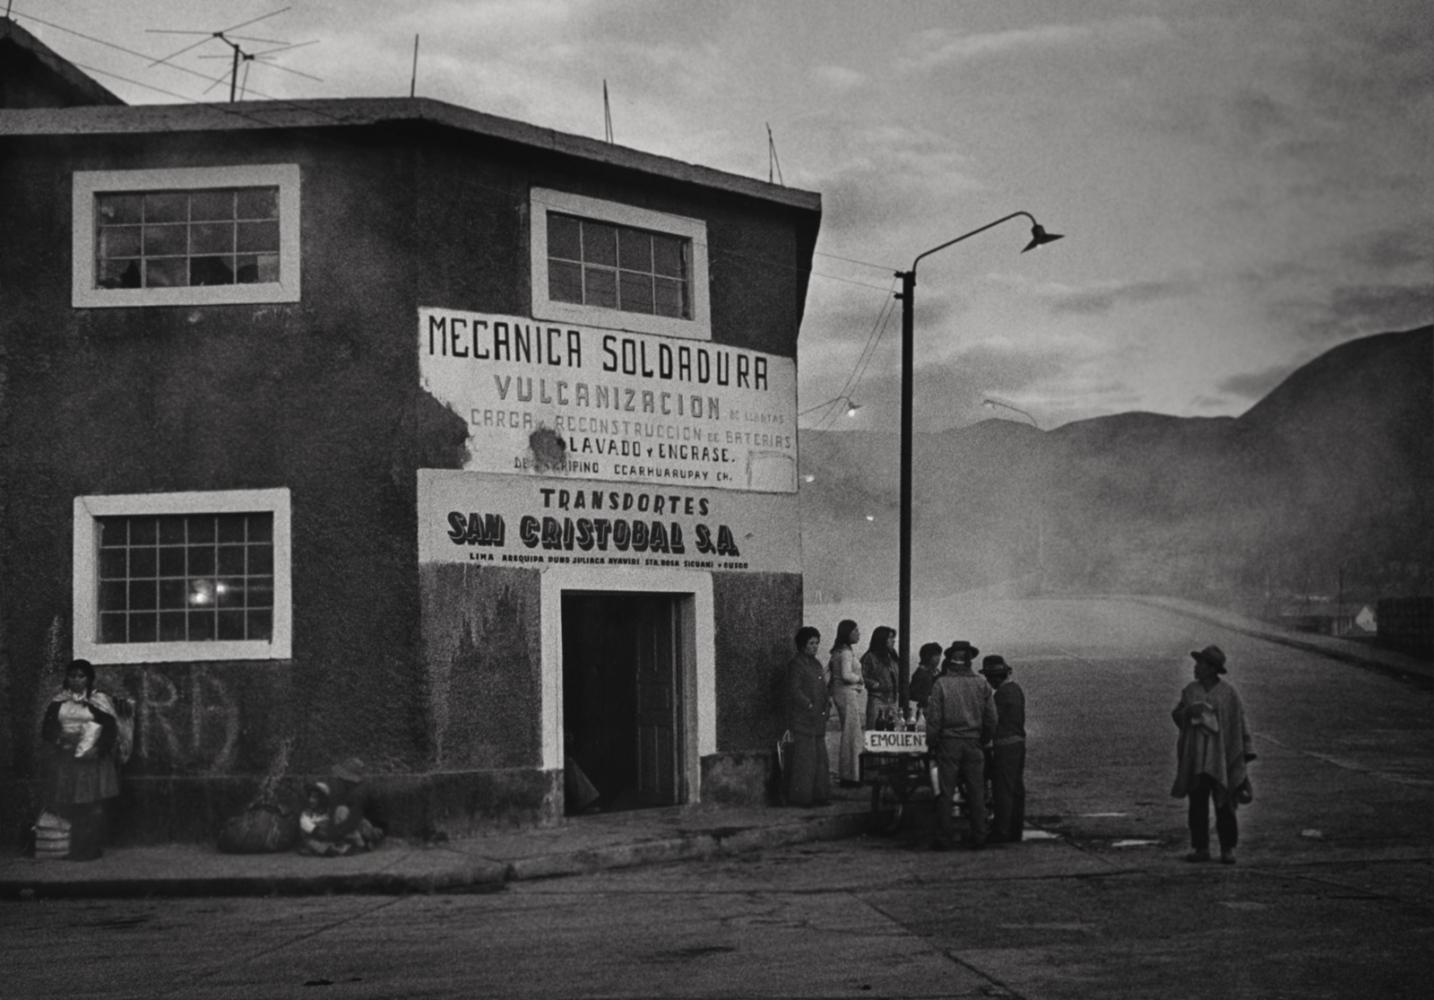 Bus Stop, Sicuane, Peru